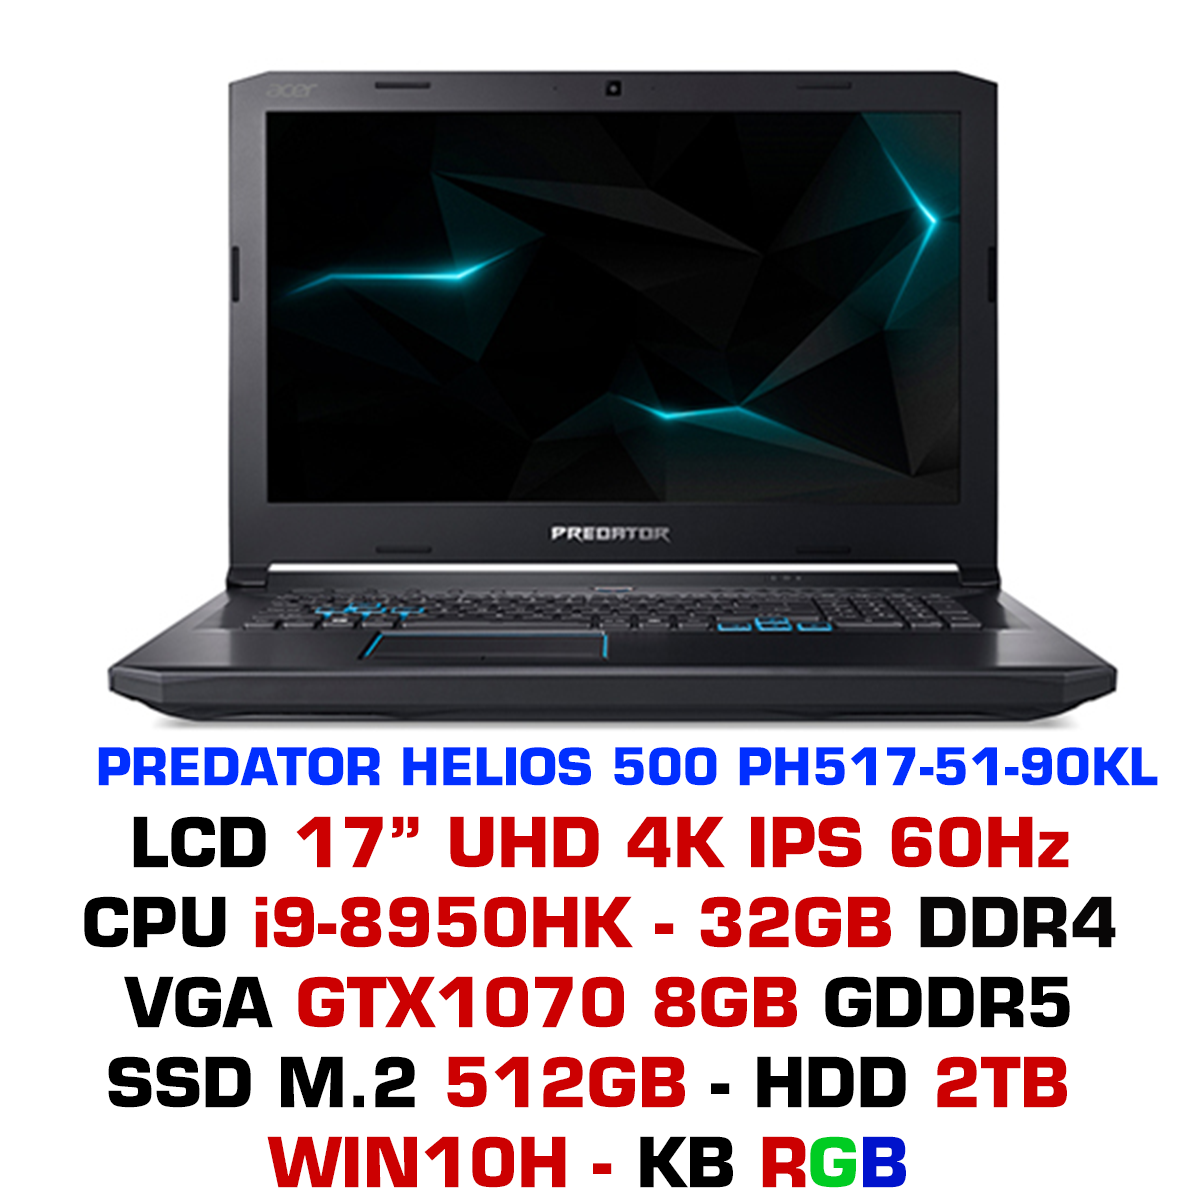 Laptop Gaming Acer Predator Helios 500 PH517-51-90KL NH.Q3PSV.002